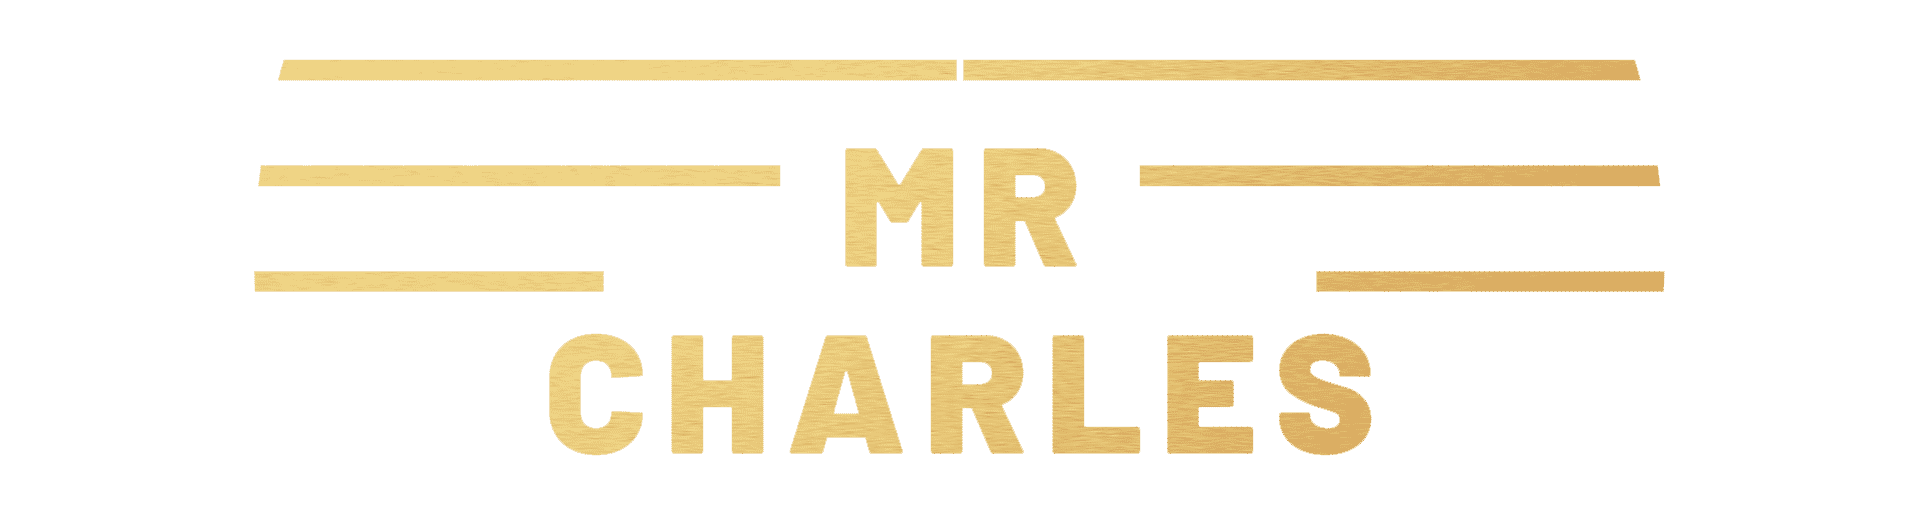 Mr Charles